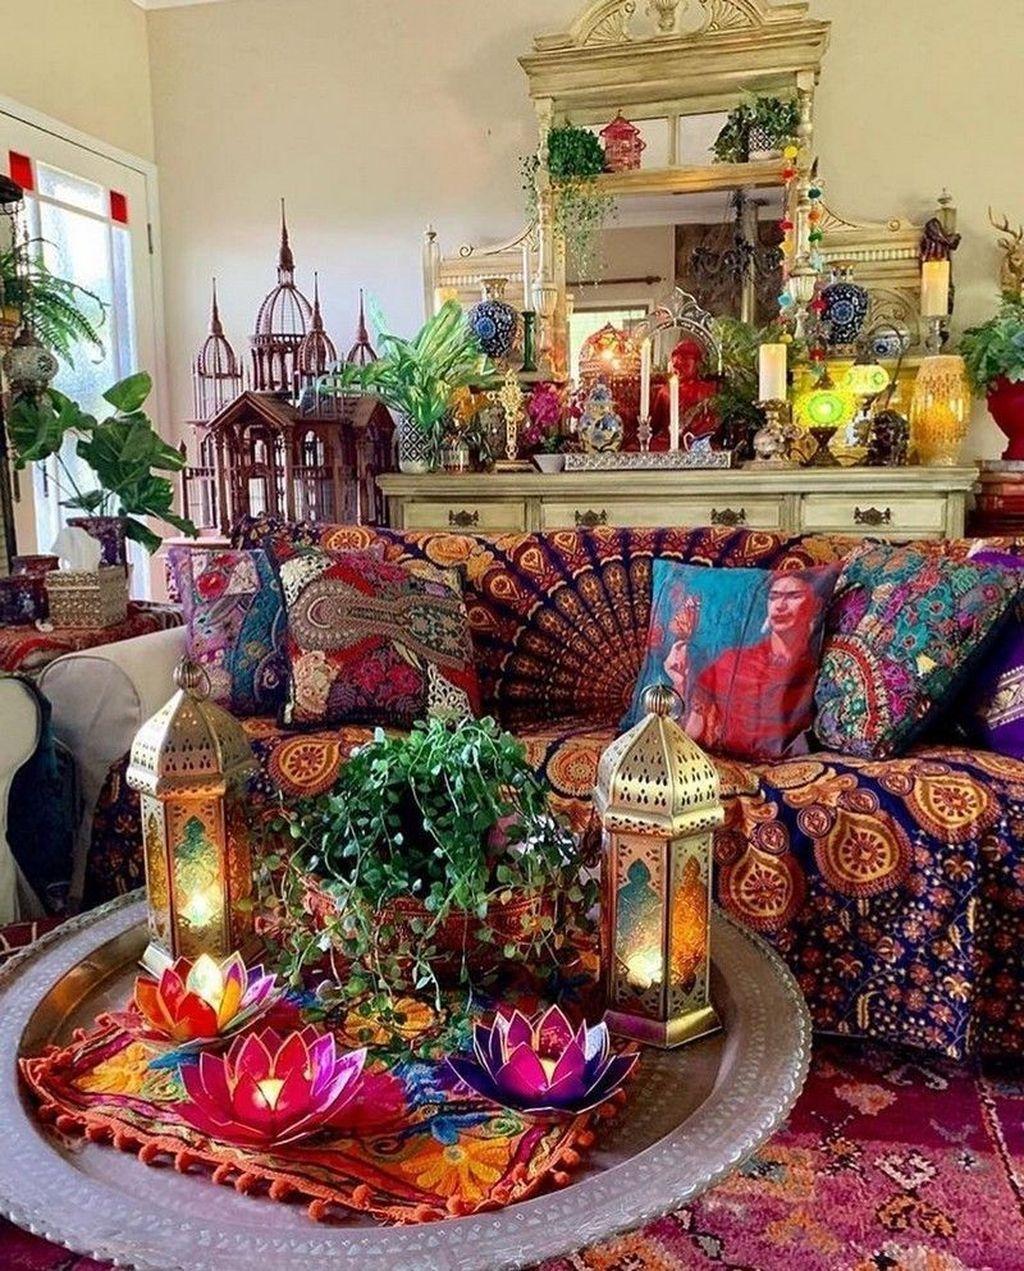 30 Unique Bohemian Decor Ideas For Living Room Trenduhome Bohemian Living Room Decor Bohemian Living Rooms Cozy Bohemian Living Room Gypsy living room decor